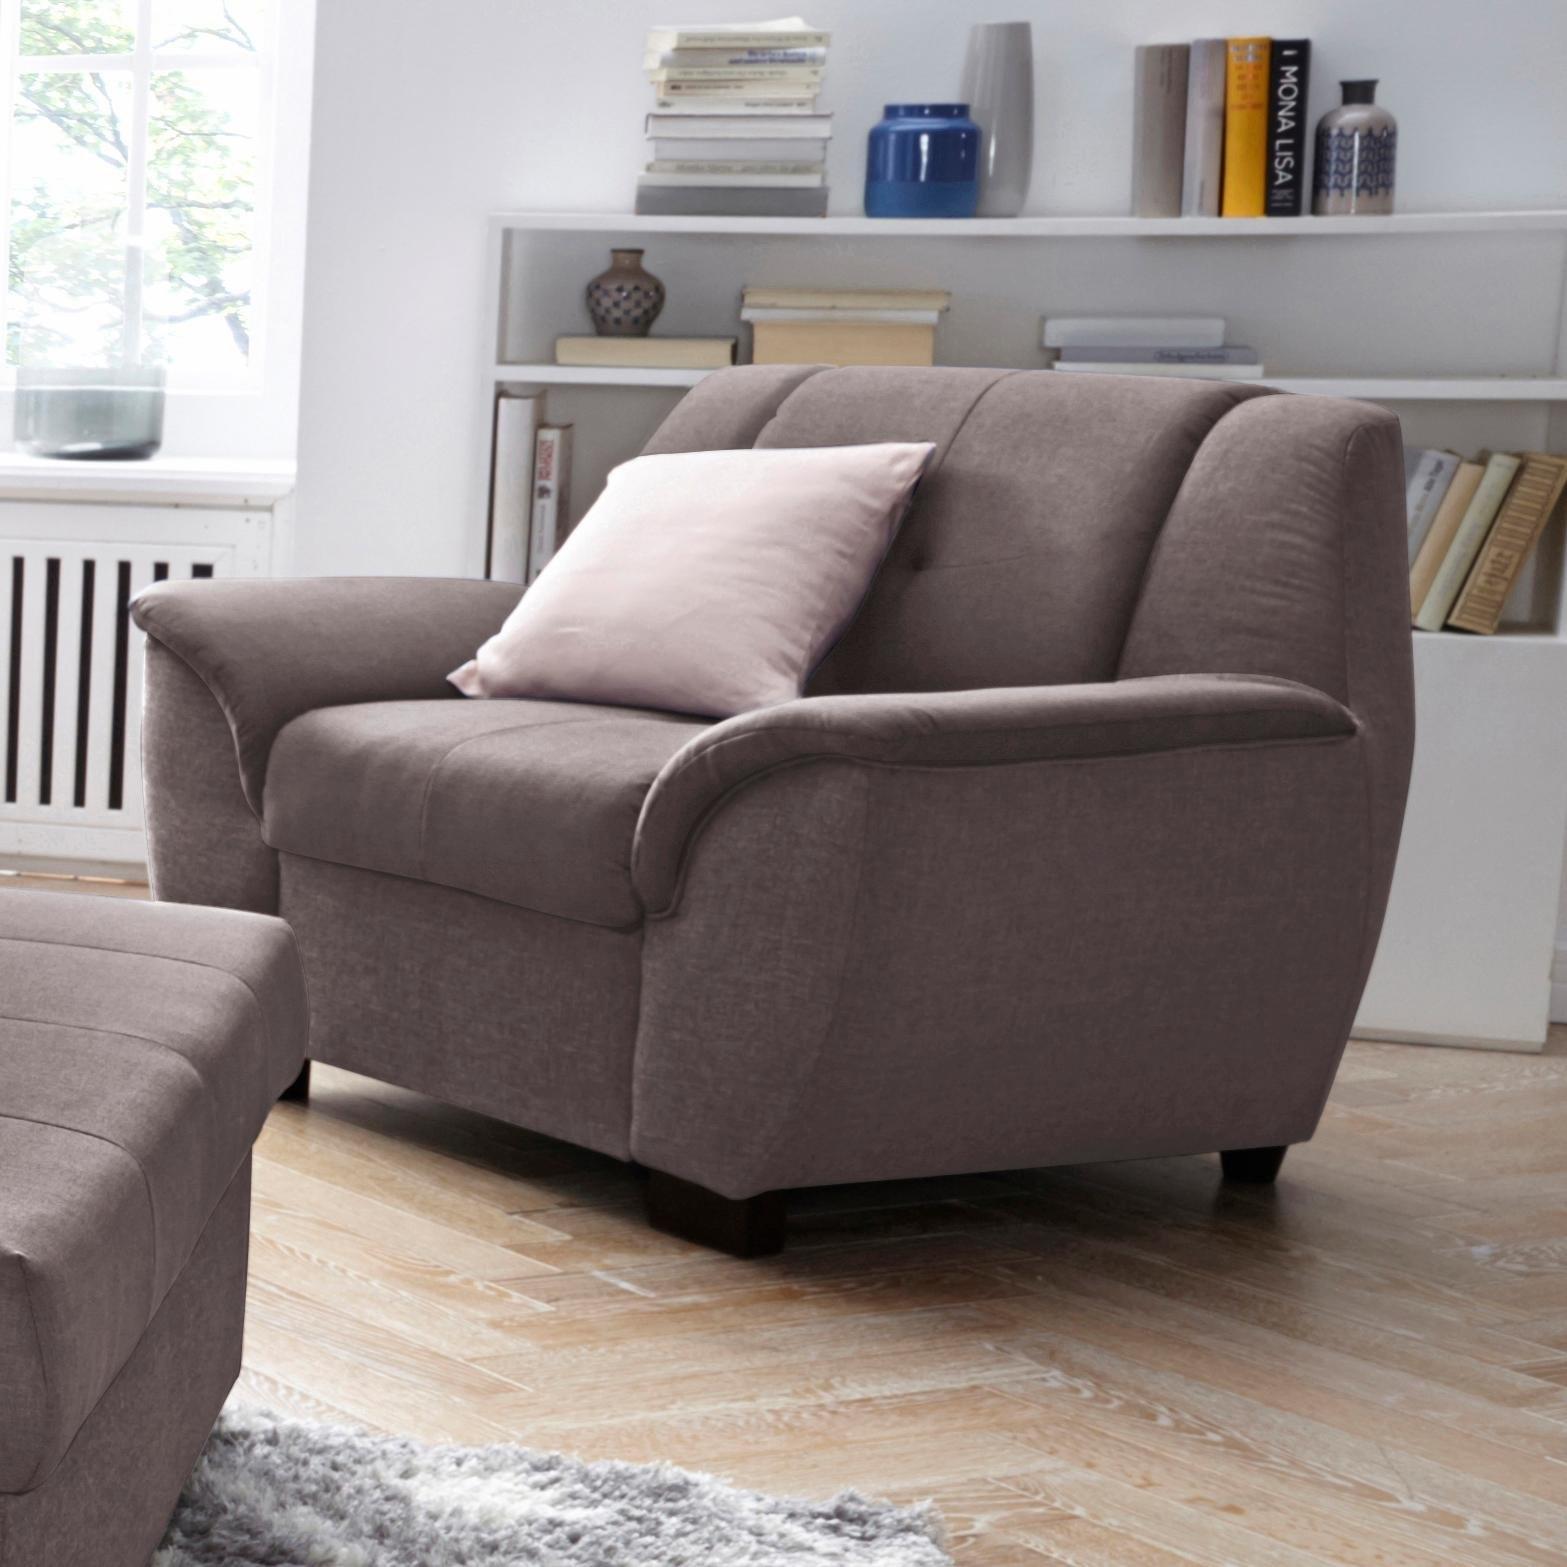 Gala Collezione fauteuil online kopen op otto.nl